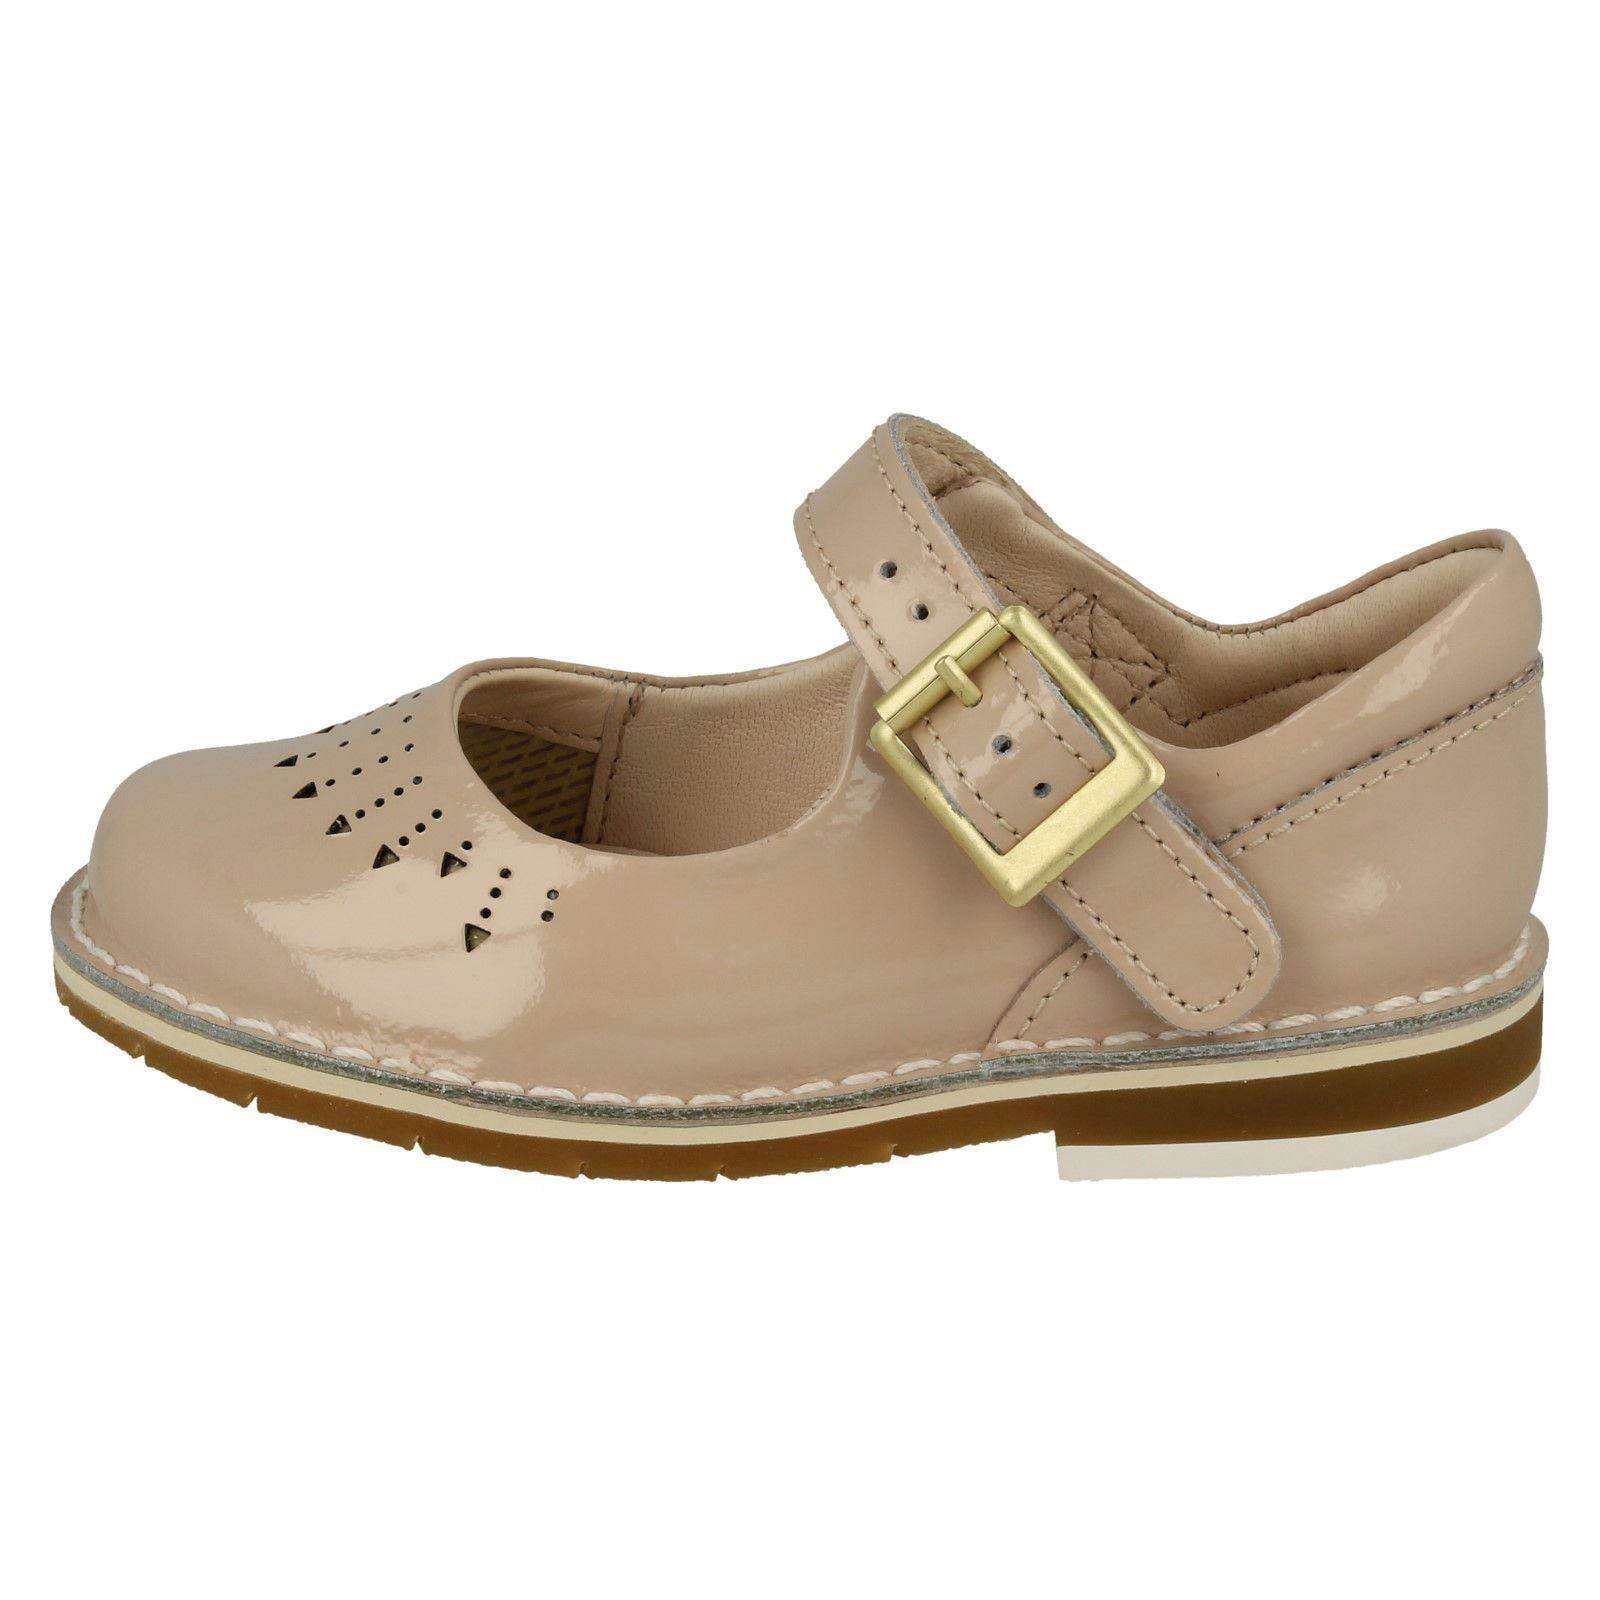 Girls Clarks Casual Shoes *Yarn Jump*